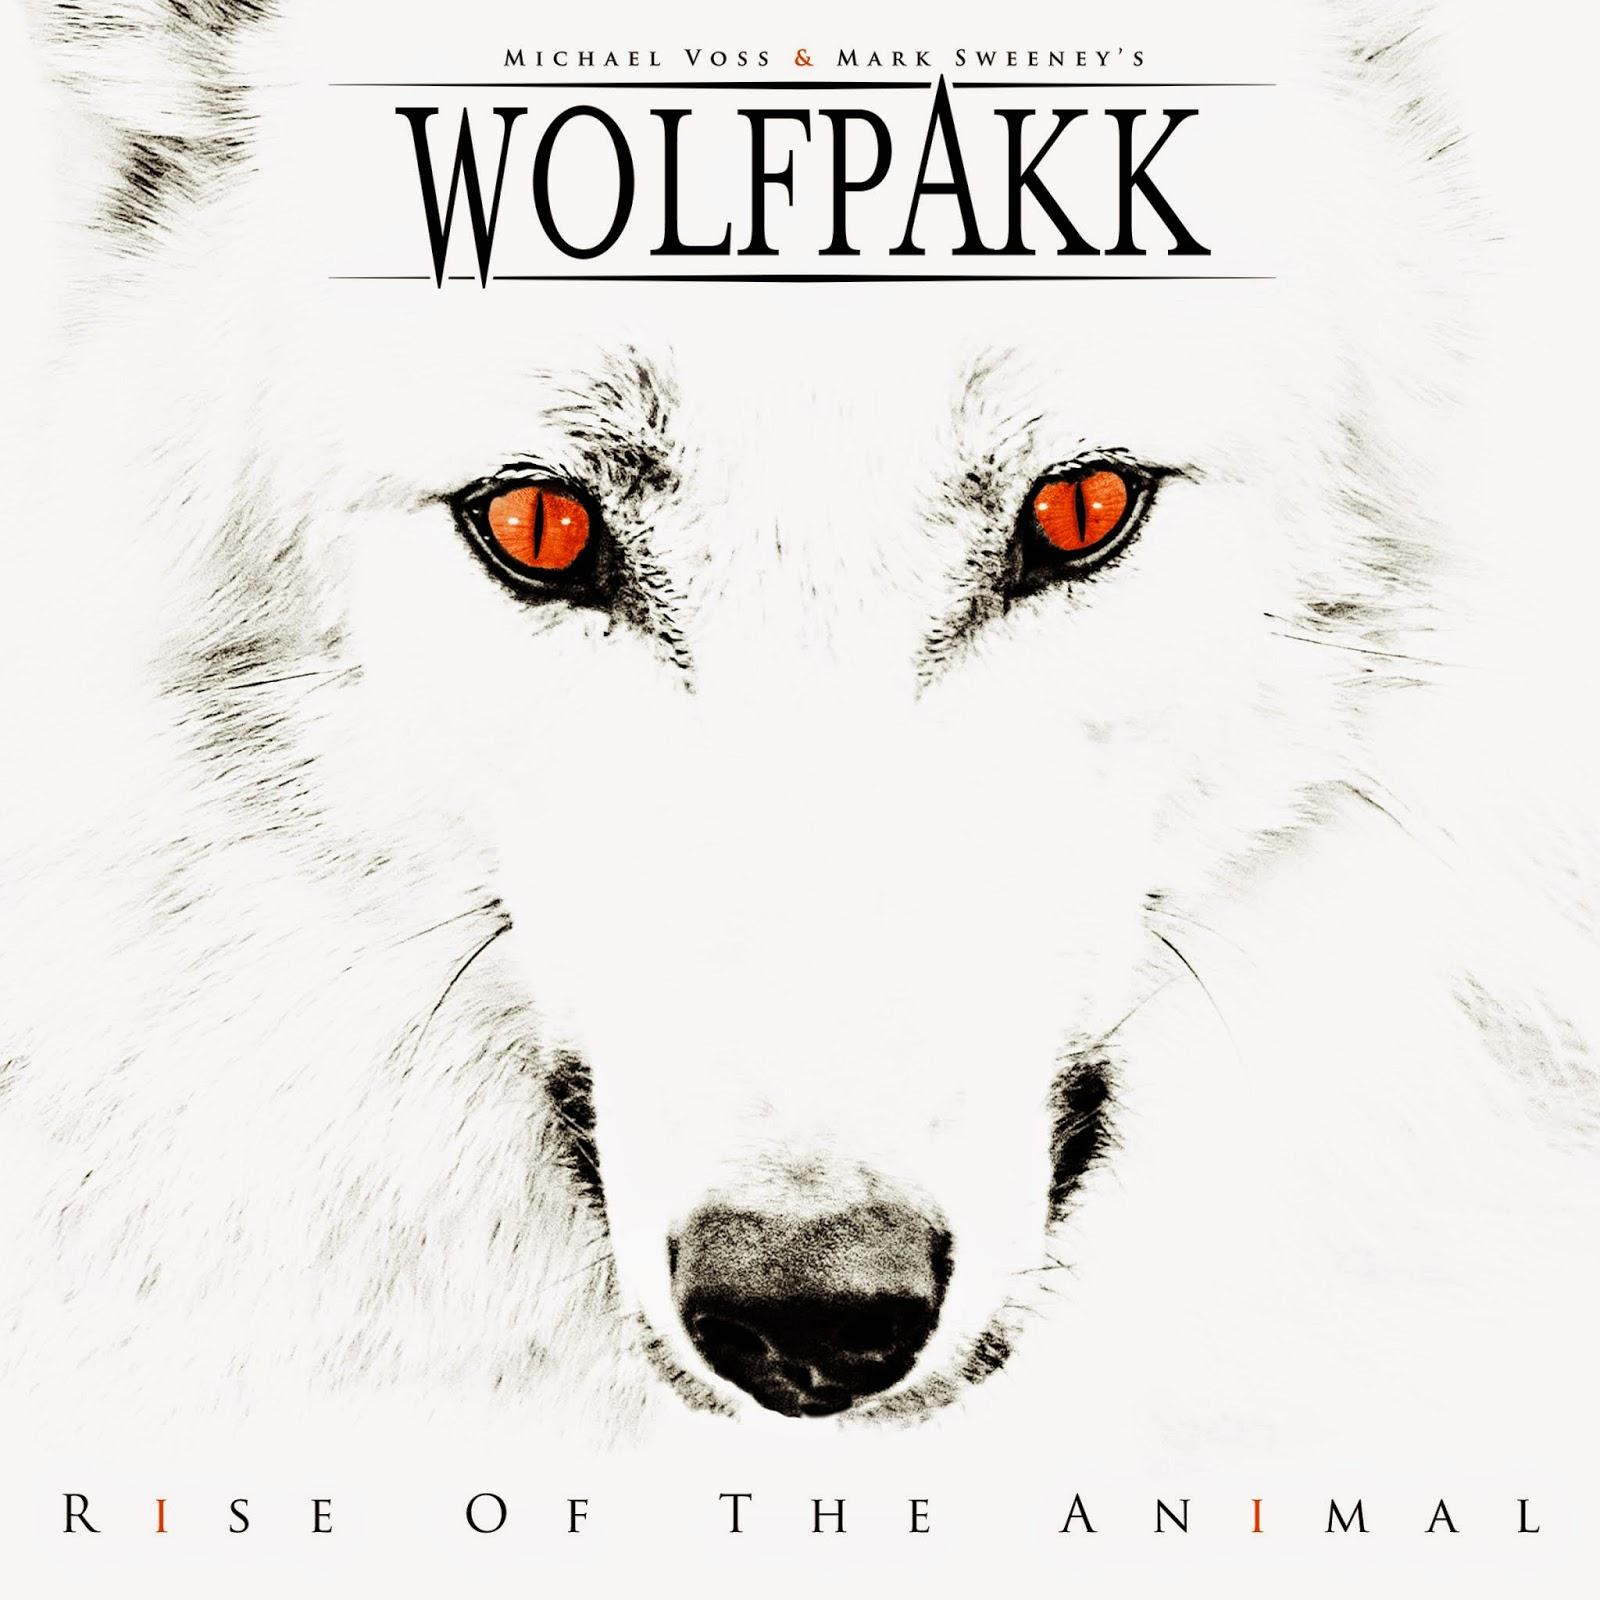 http://rock-and-metal-4-you.blogspot.de/2015/02/cd-review-wolfpakk-rise-of-animal.html